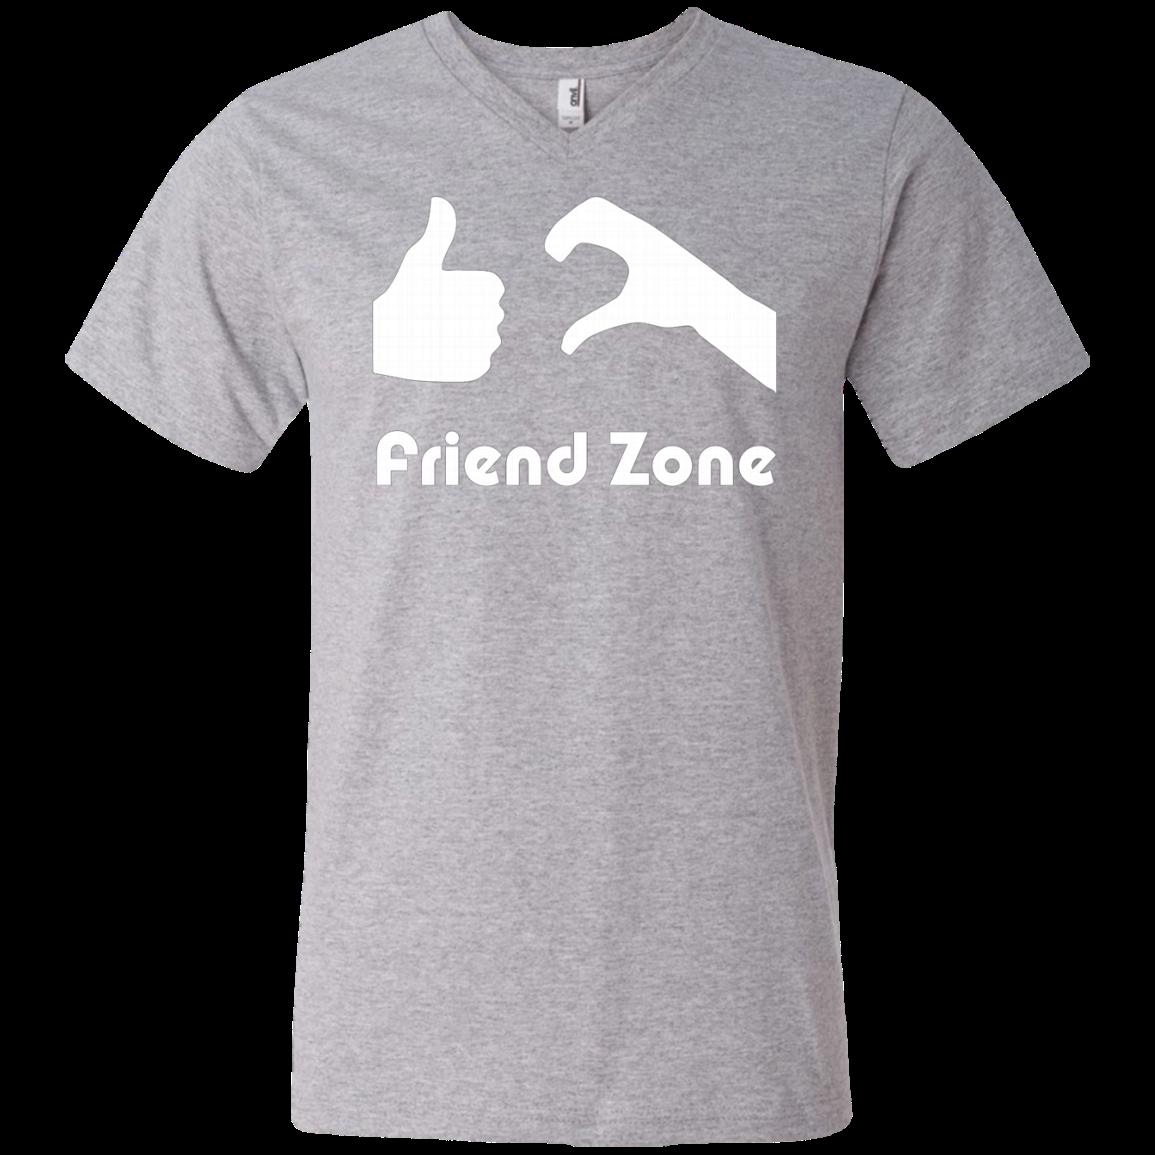 Friend Zone AT0060 982 Men's Printed V-Neck T-Shirt - Heather Grey / L